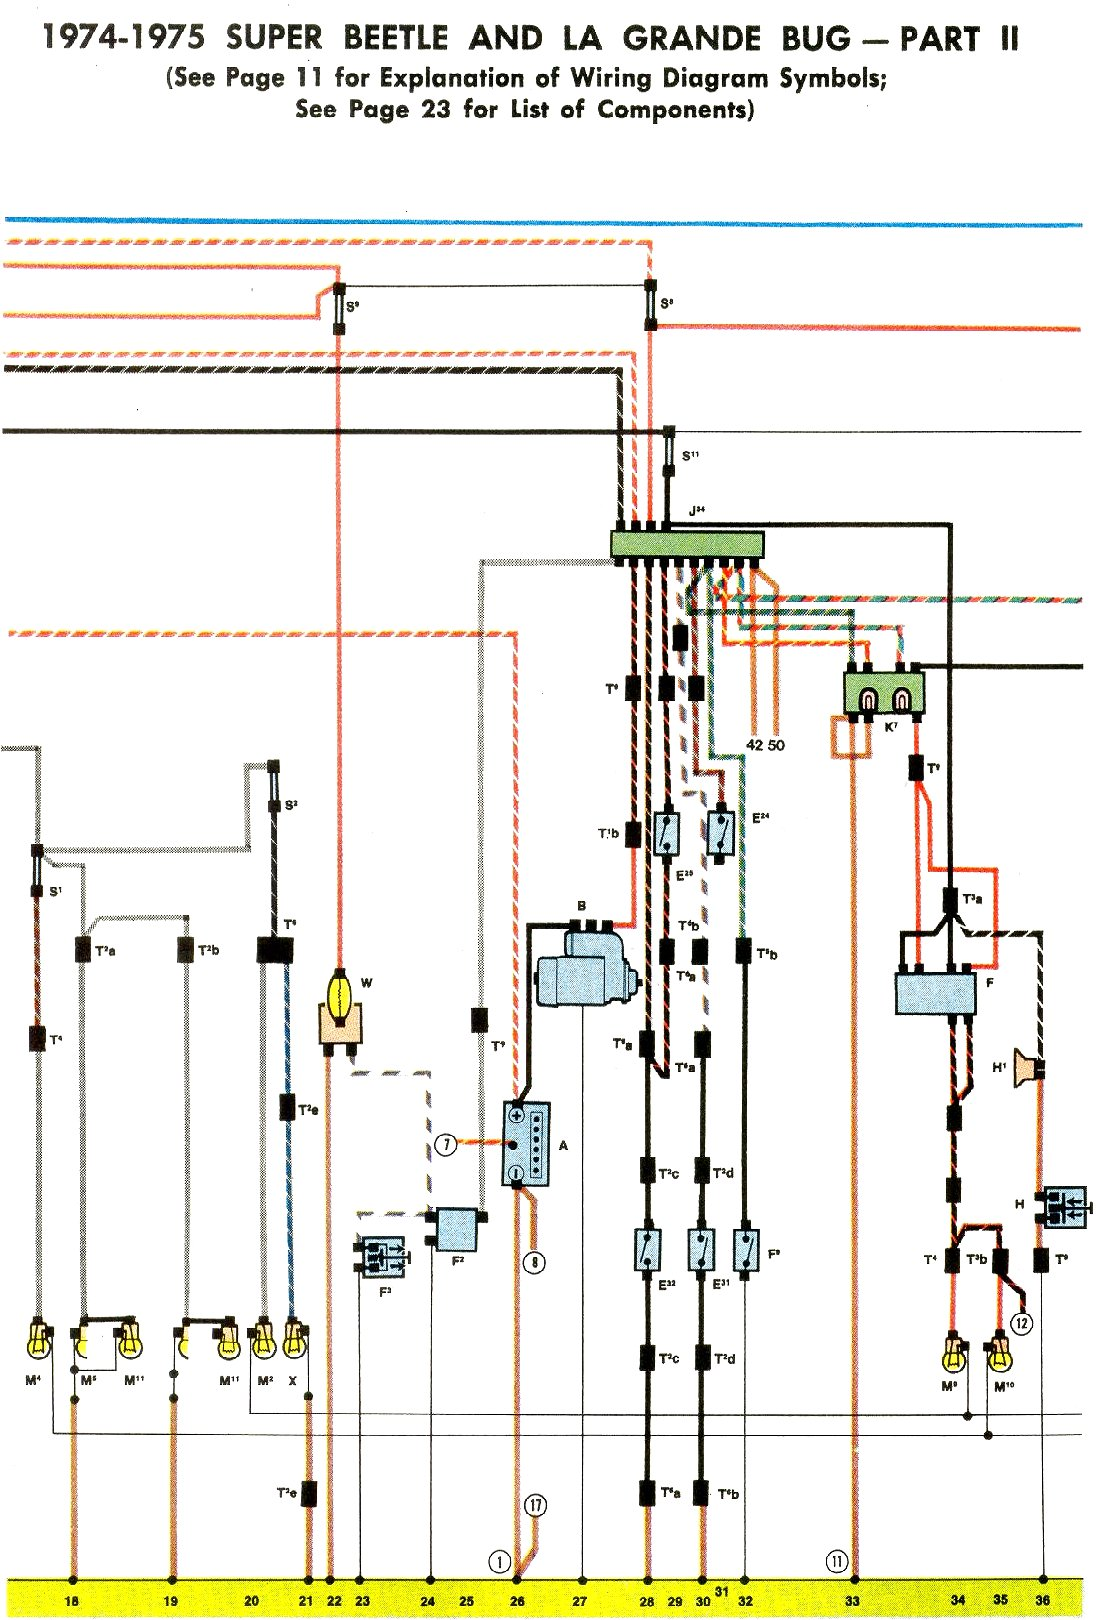 bug_7475_b vw bug wiring schematic volkswagen wiring diagram instructions 1970 vw bug wiring schematic at suagrazia.org